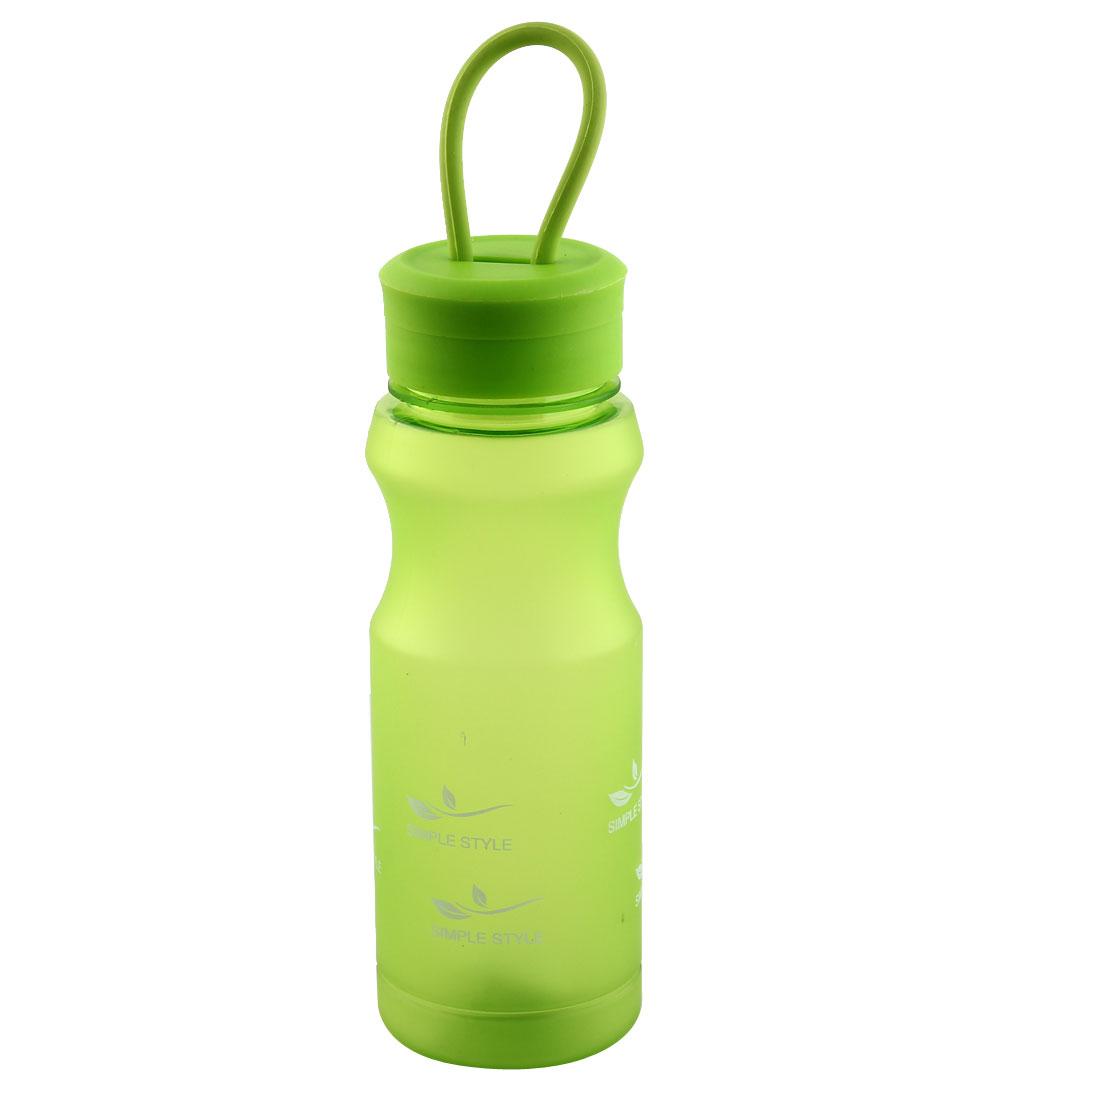 Outdoor Travel Plastic Letter Pattern Running Water Bottle Frosted Tea Cup Mug Biking Sports Kettle Green 500ml